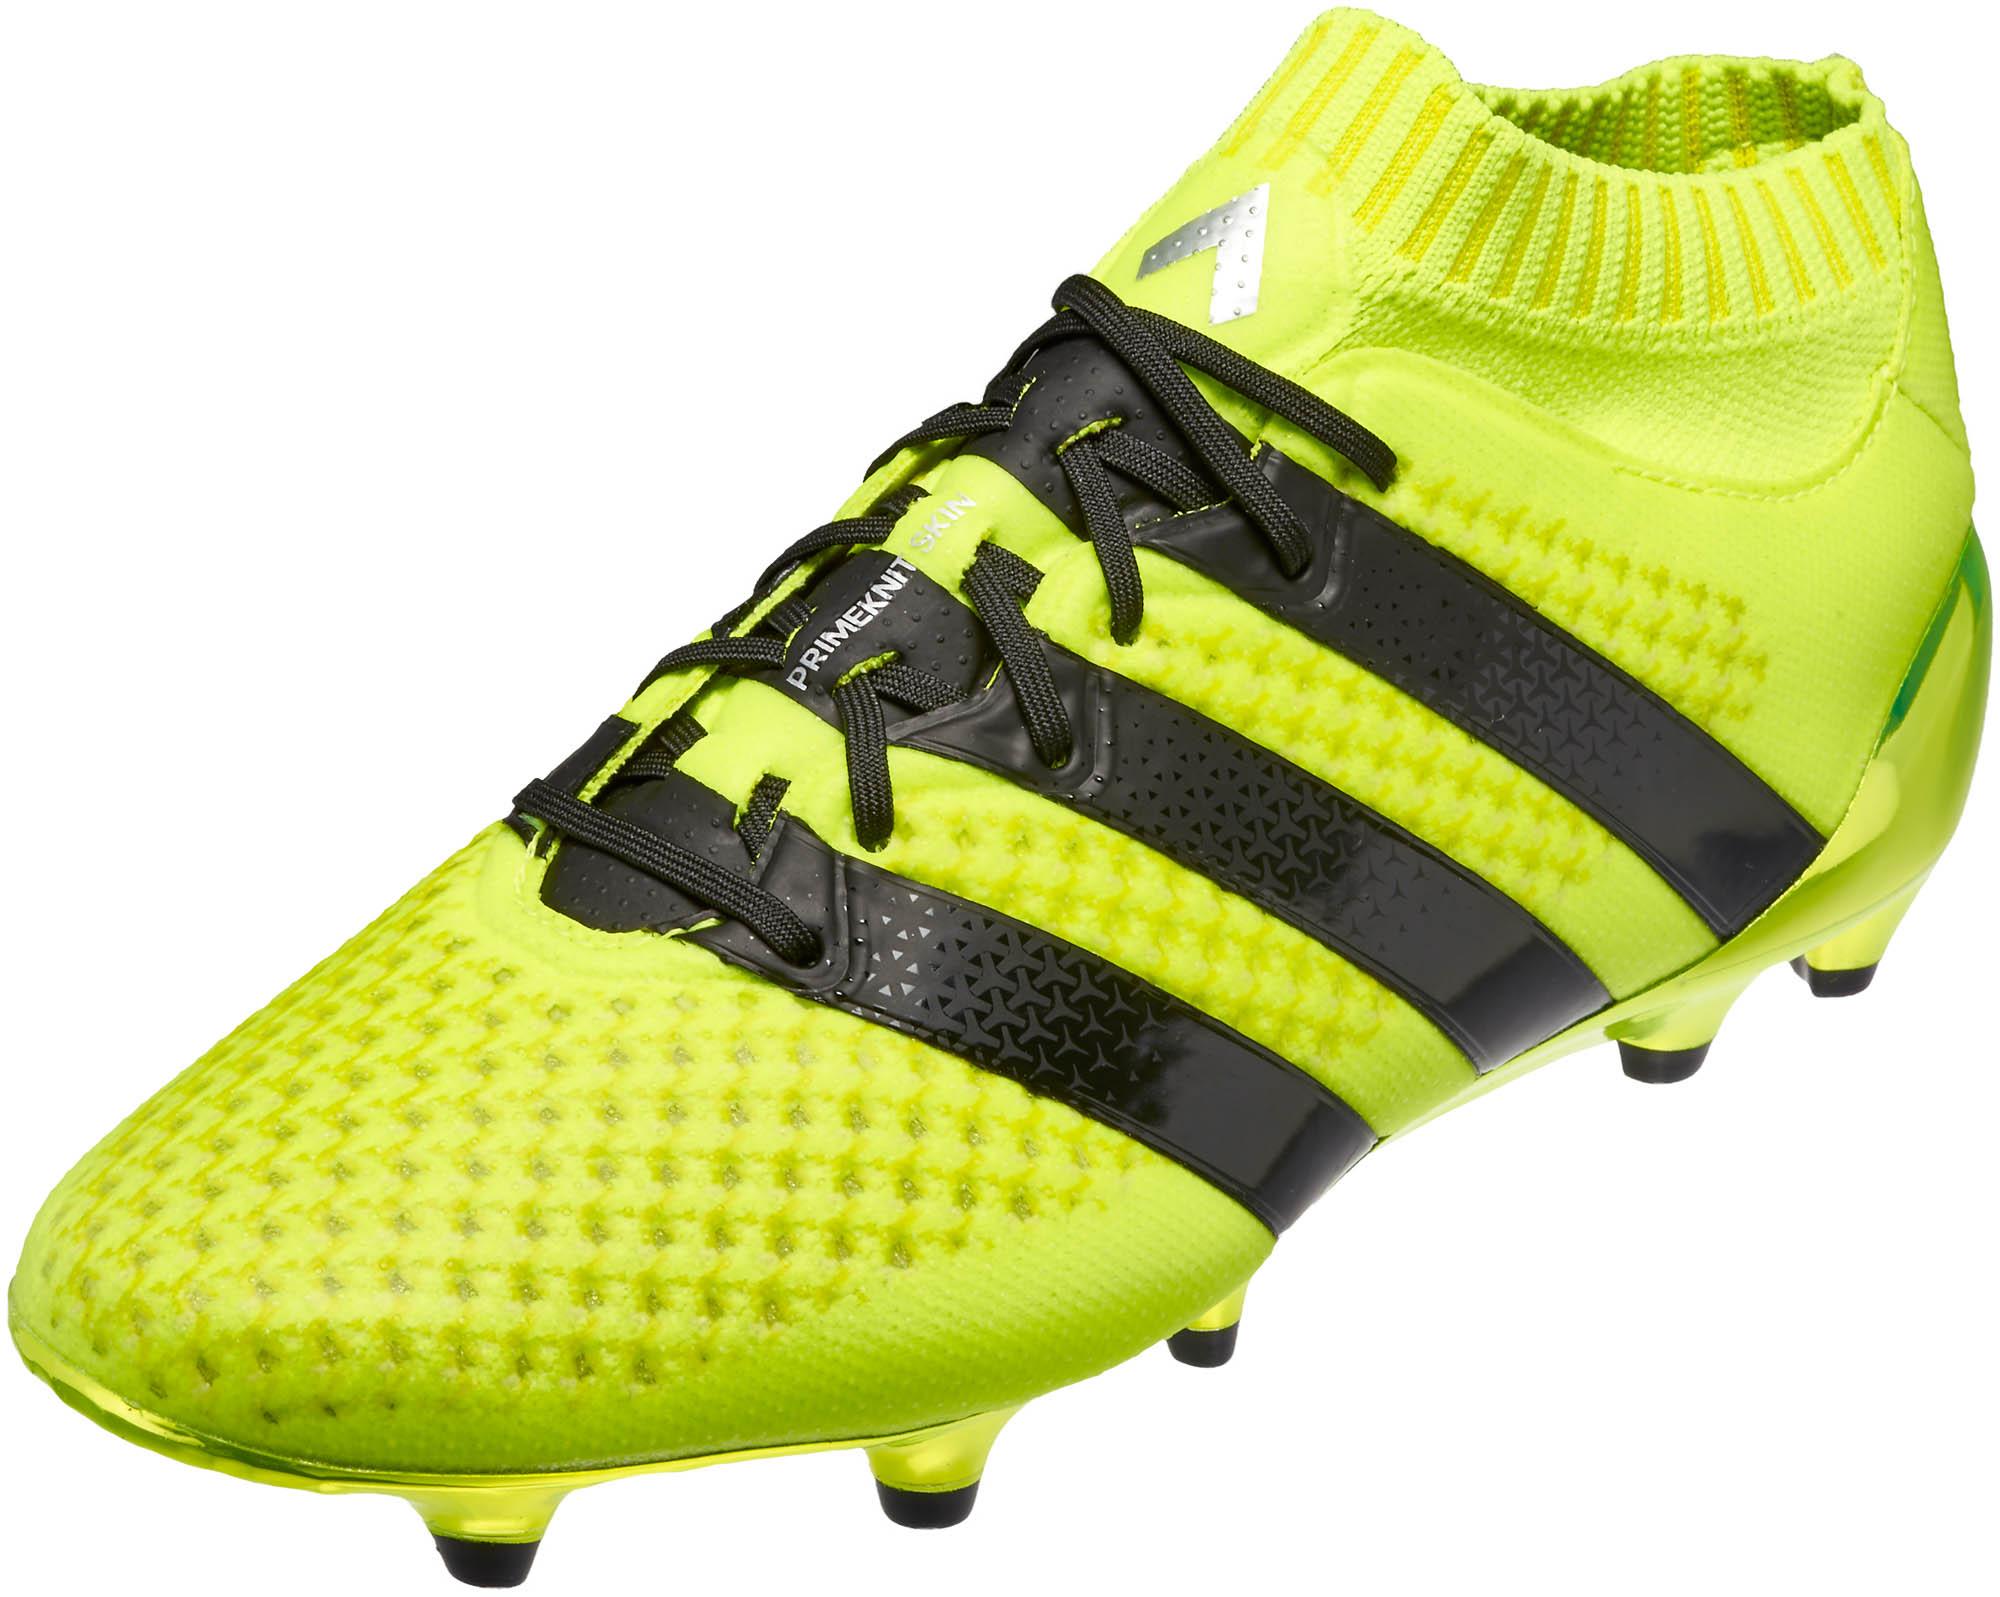 adidas Kids ACE 16.1 Primeknit FG – Solar Yellow Silver Metallic 2c0b5f1417